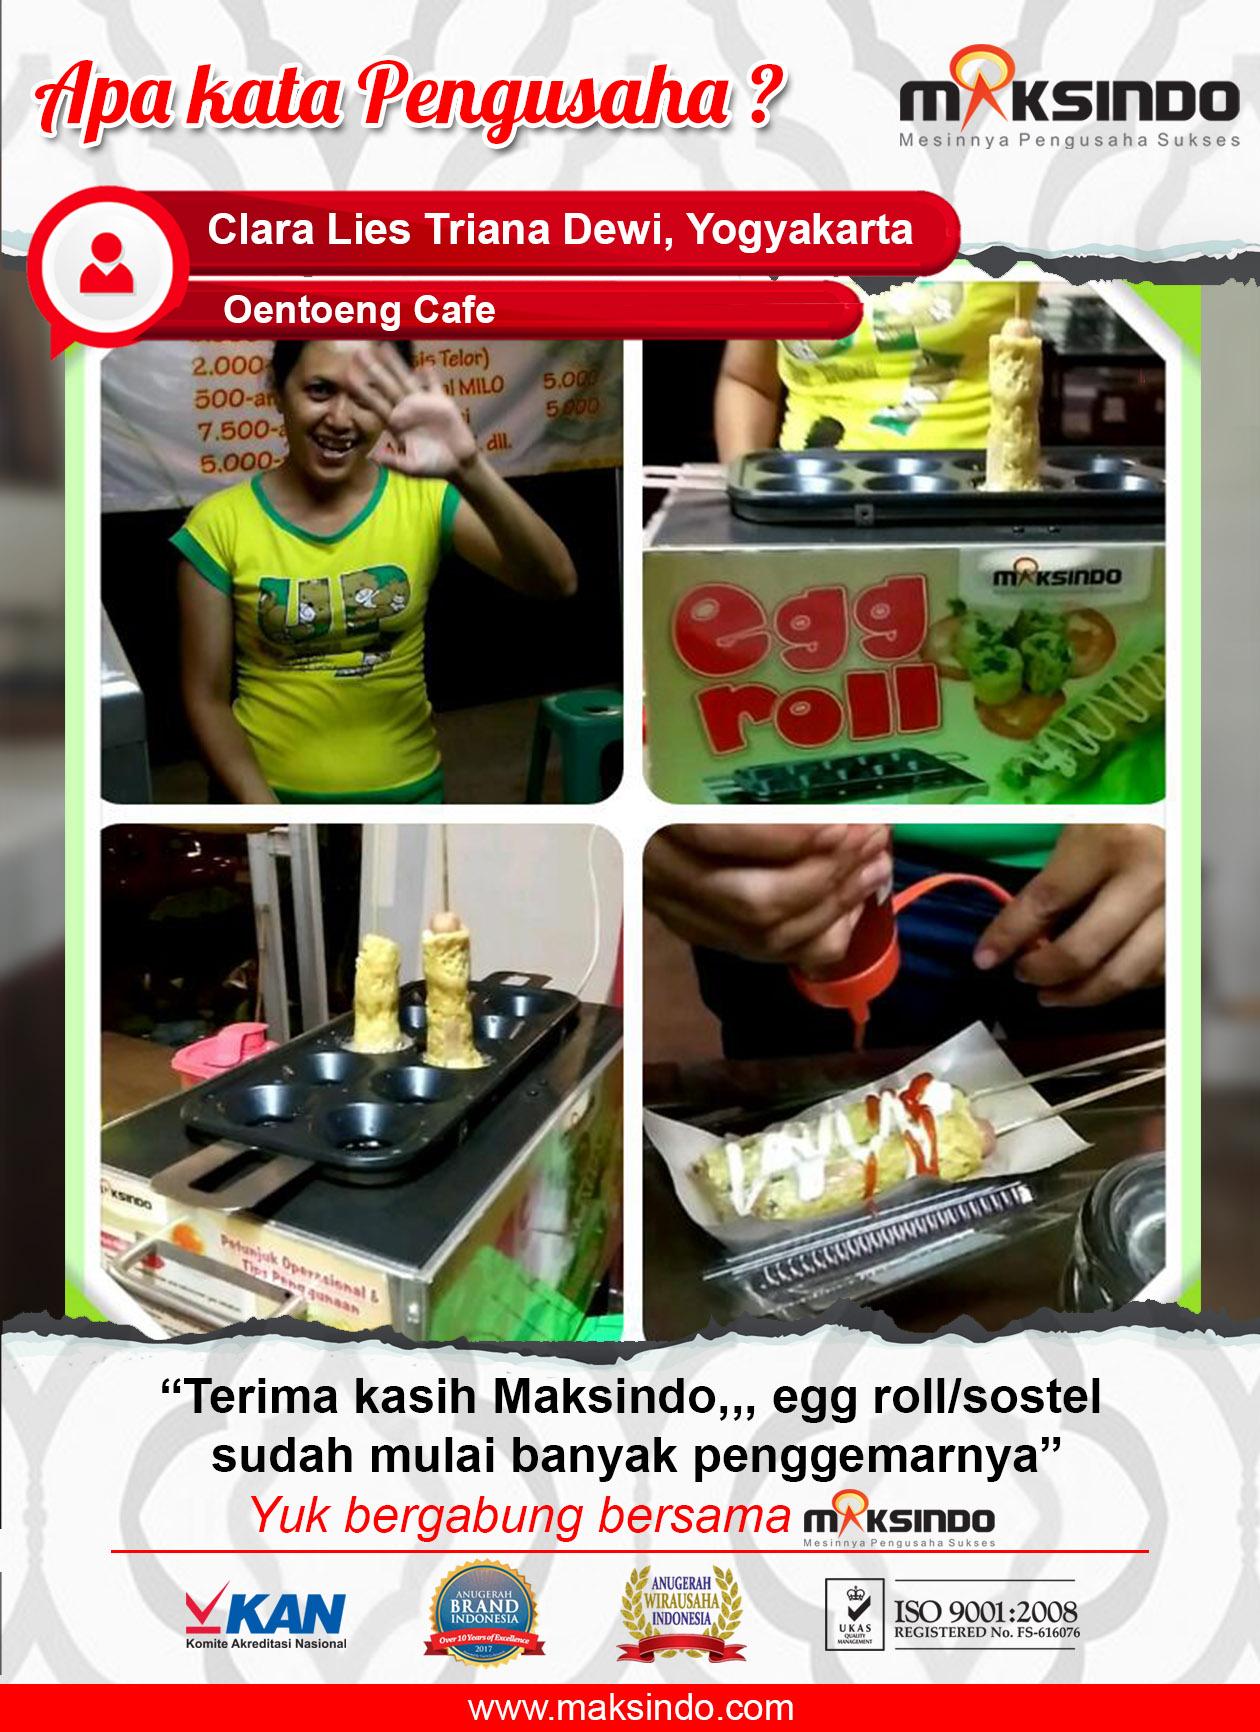 Oentoeng Cafe : Usaha Makin Lancar Dengan Mesin Egg Roll Maksindo